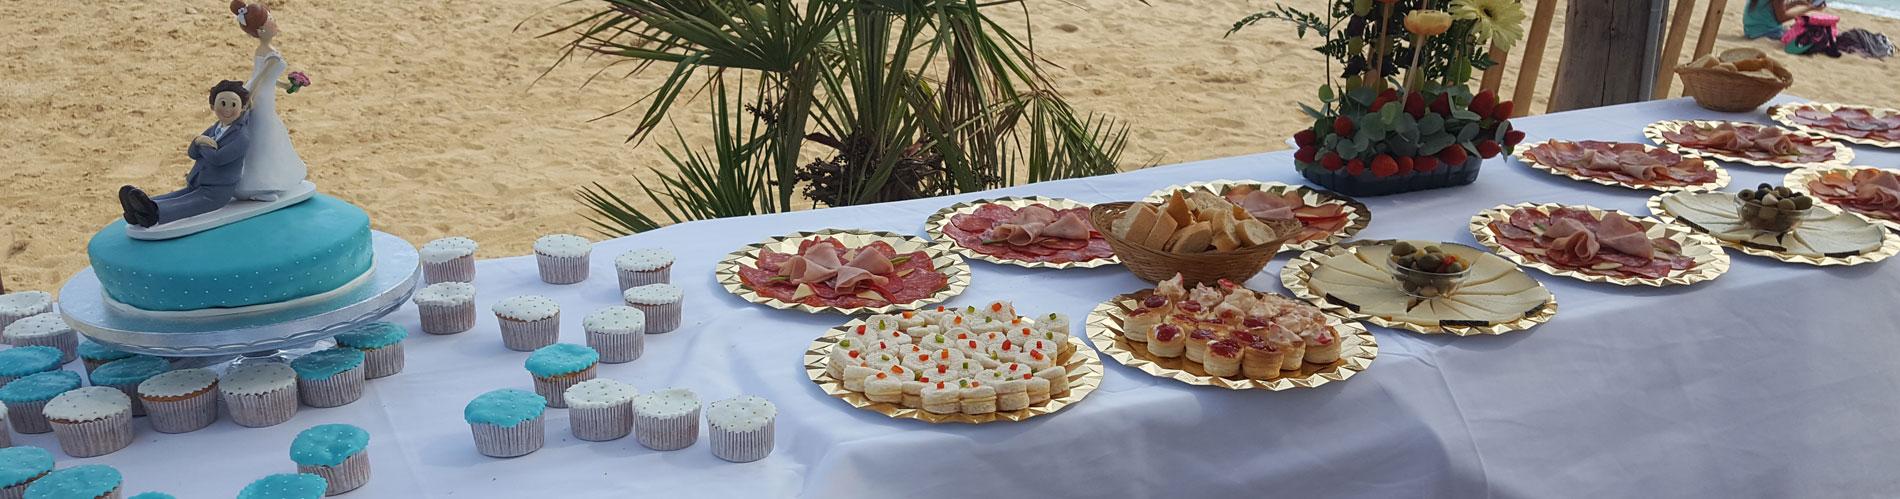 tq-catering-tqsabroso-barcelona